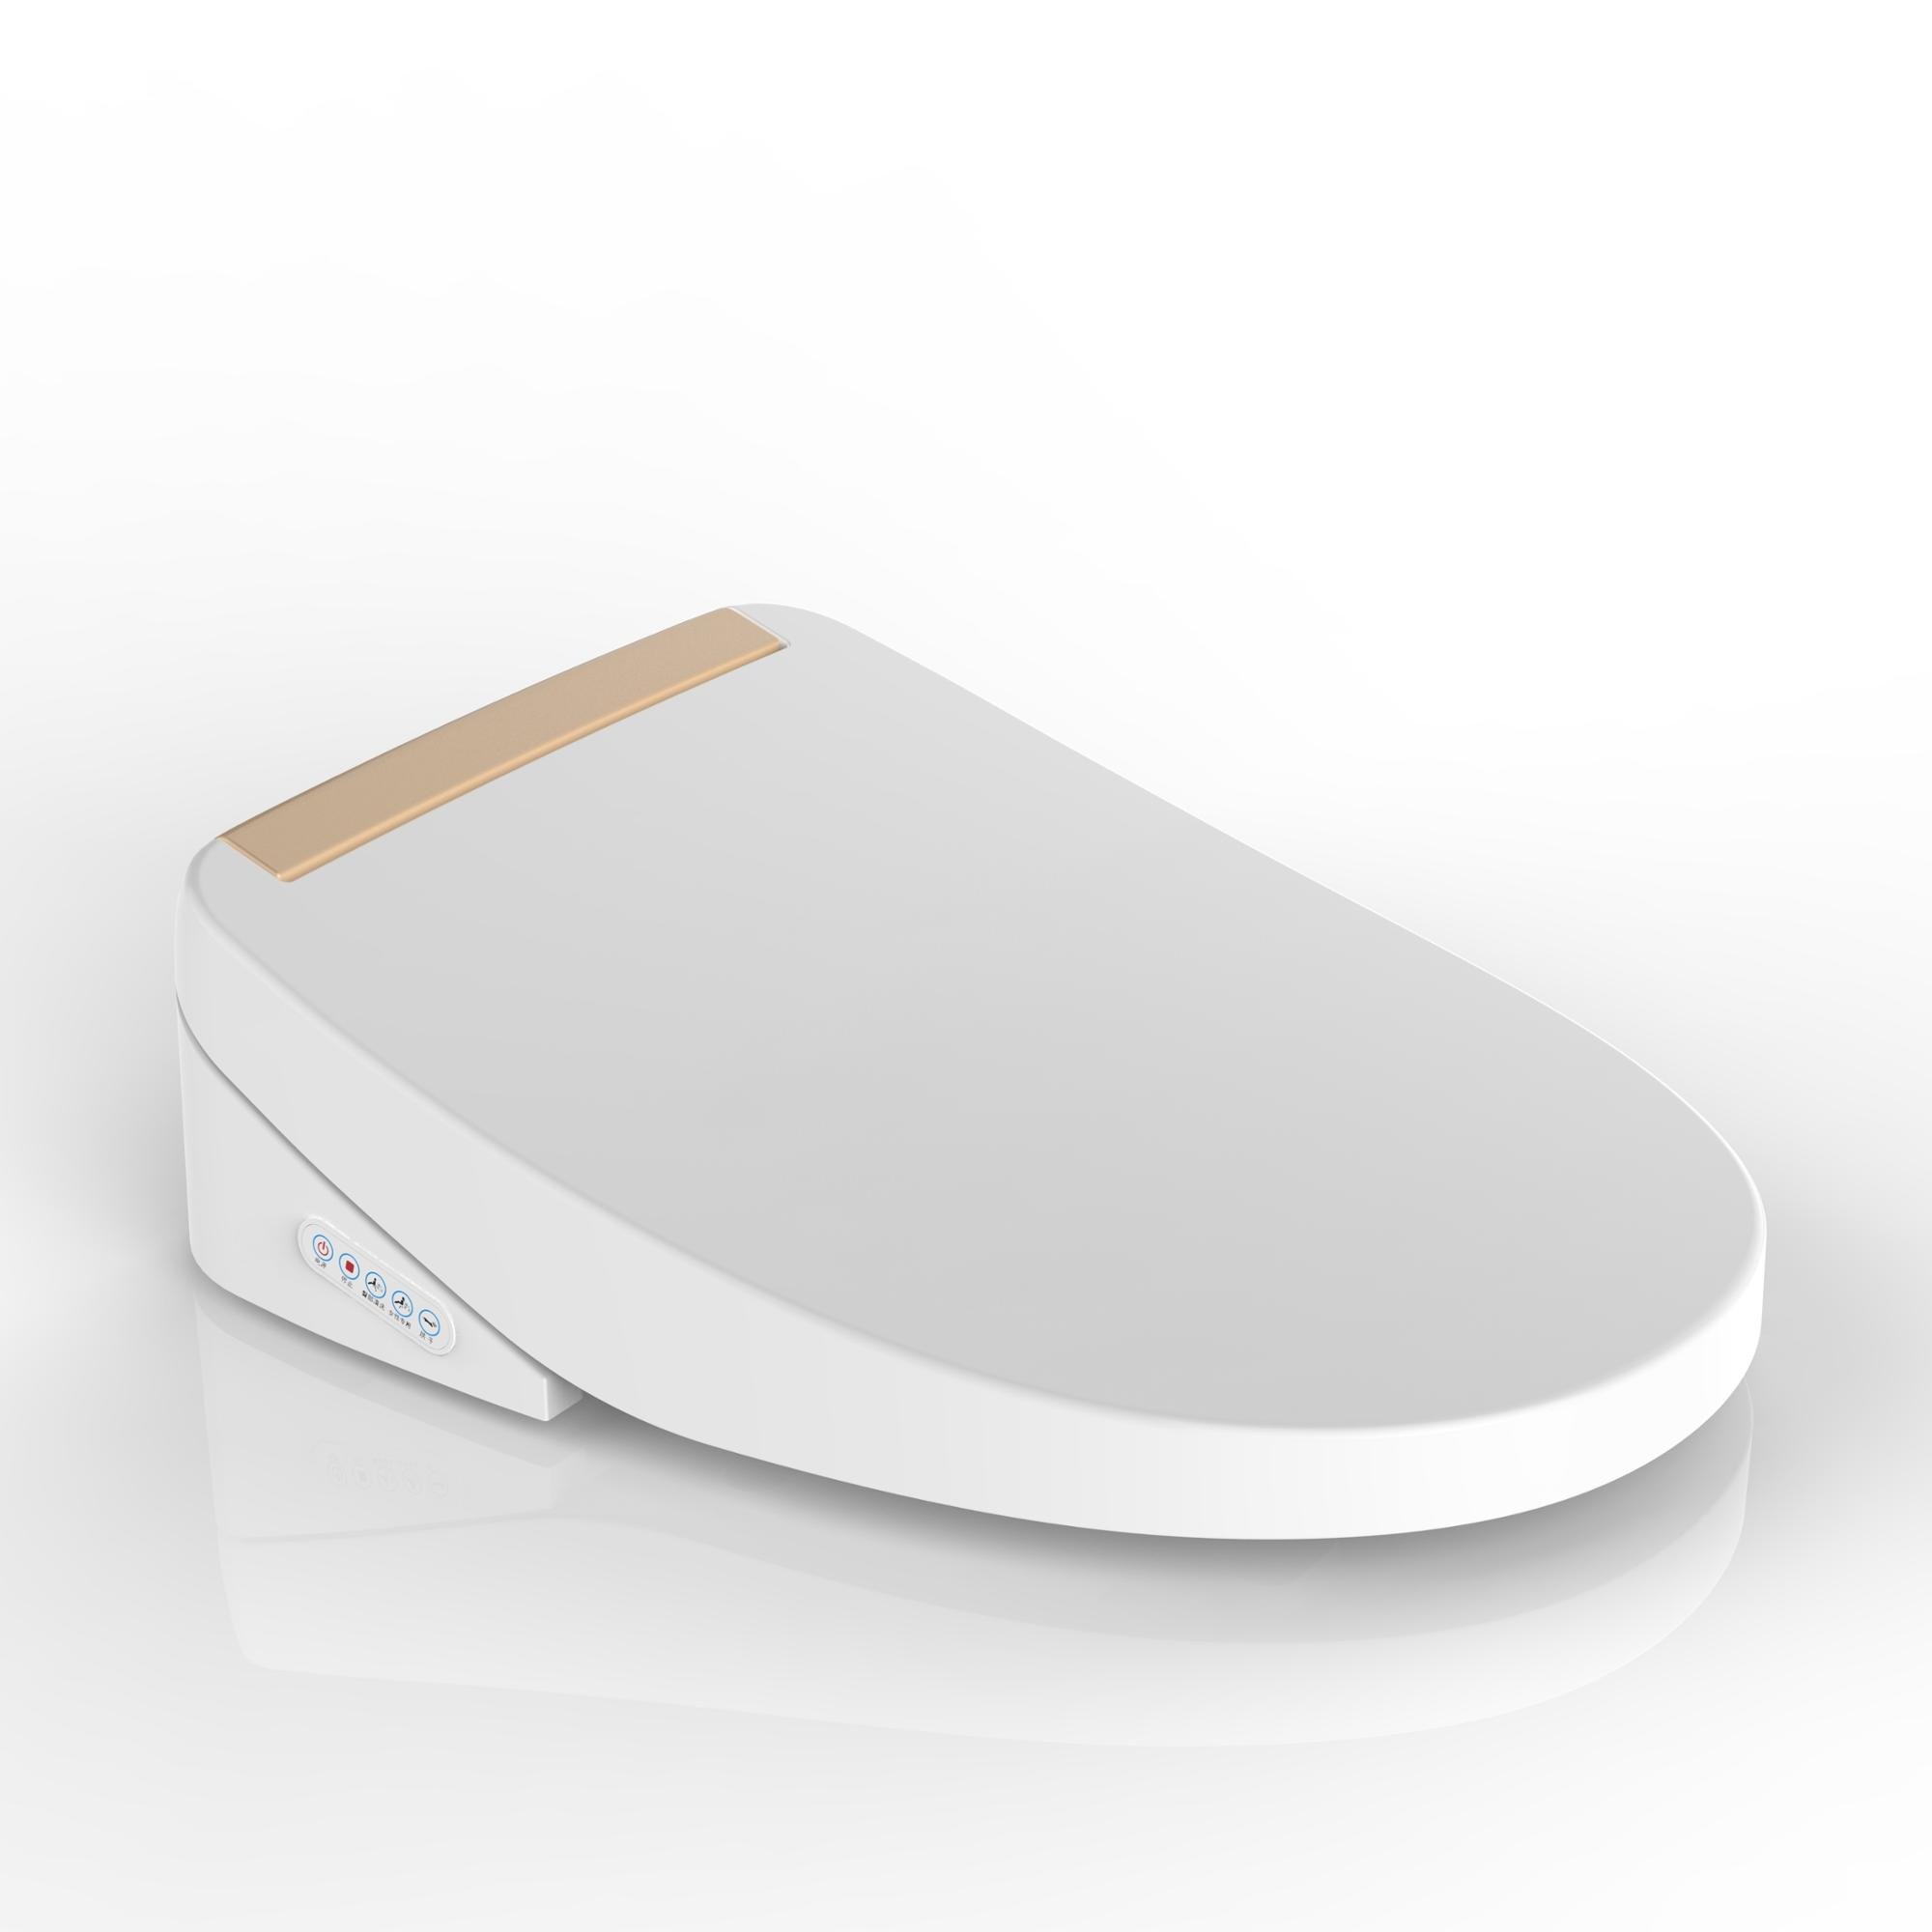 High-tech watermark soft close electronic bidet